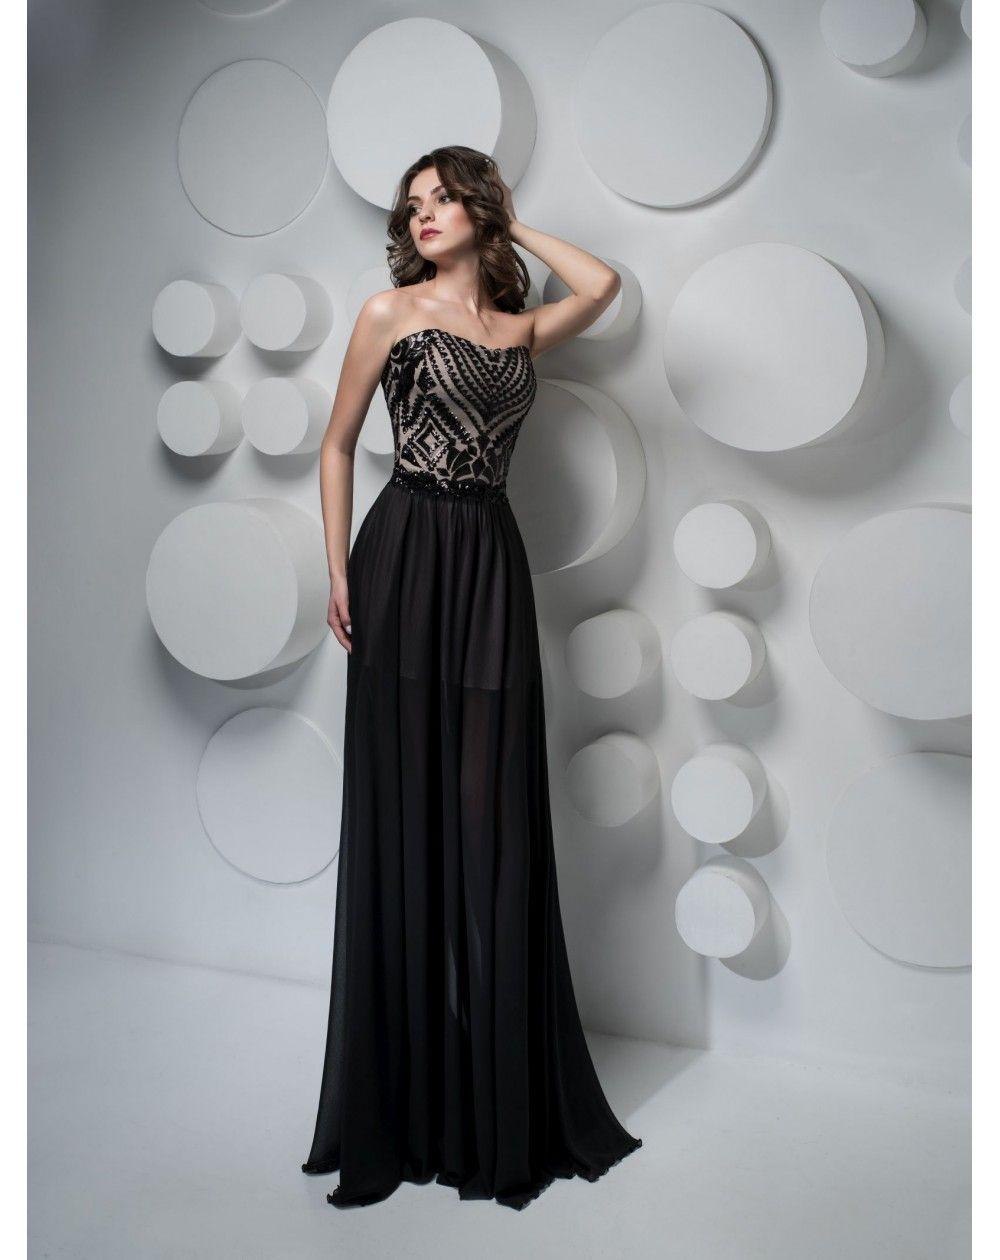 a58bc30ed1a1 Luxusné spoločenské šaty LUCILE Formálne Šaty